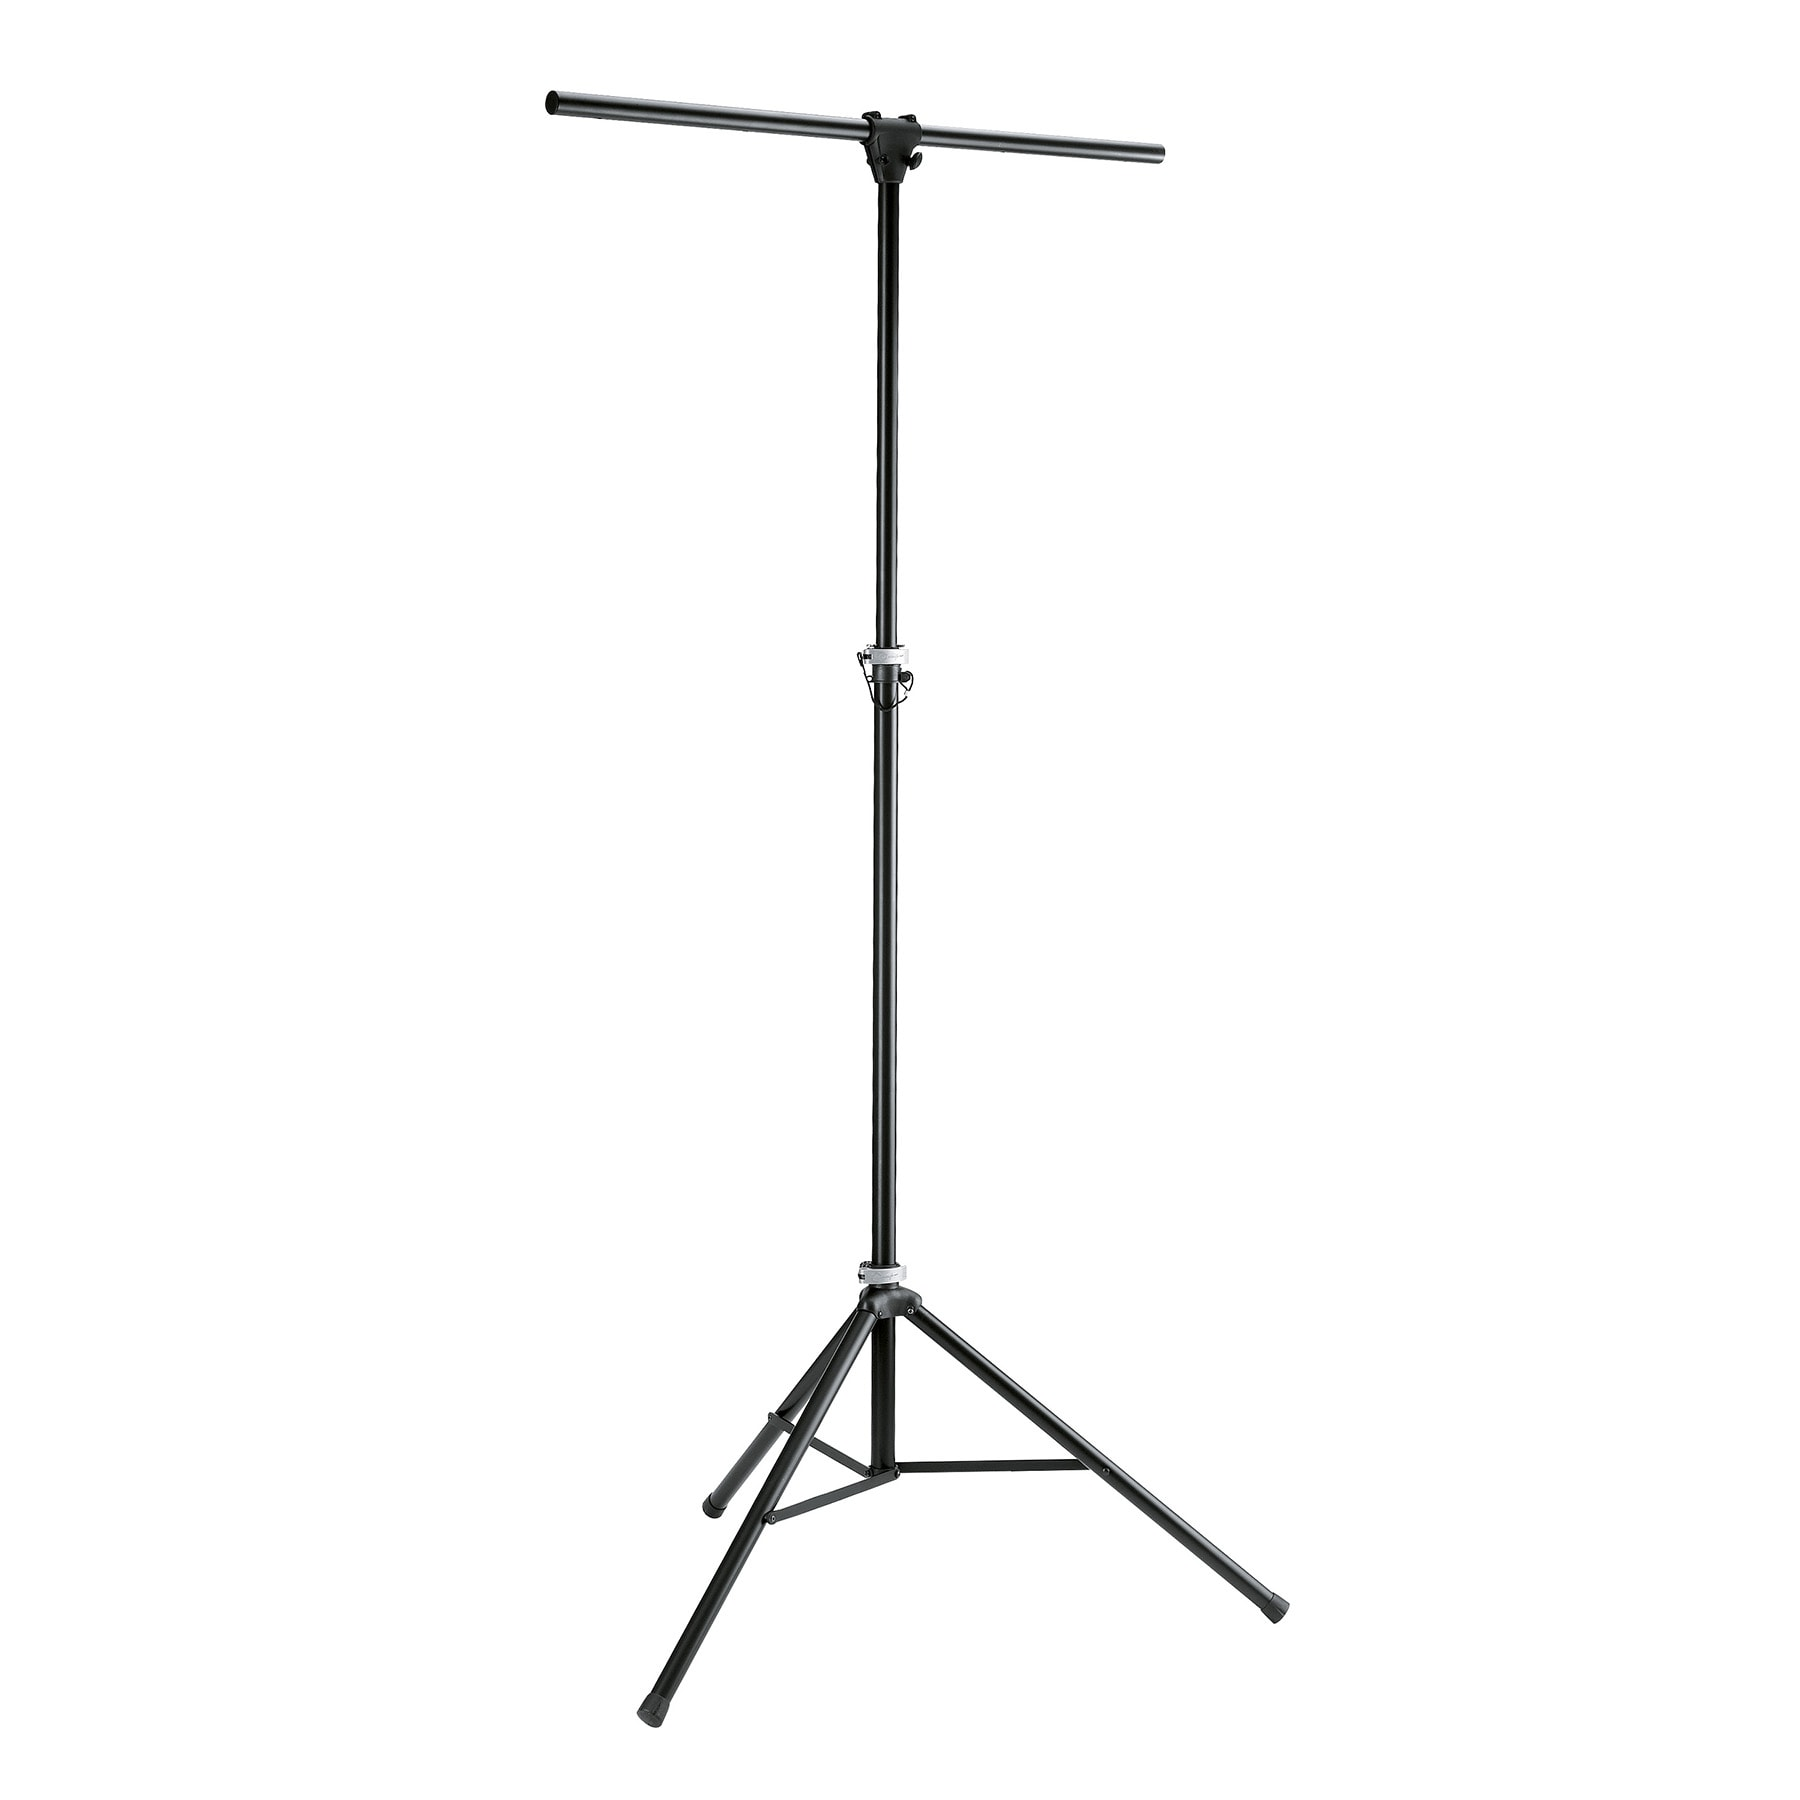 KM24620 - Lighting stand